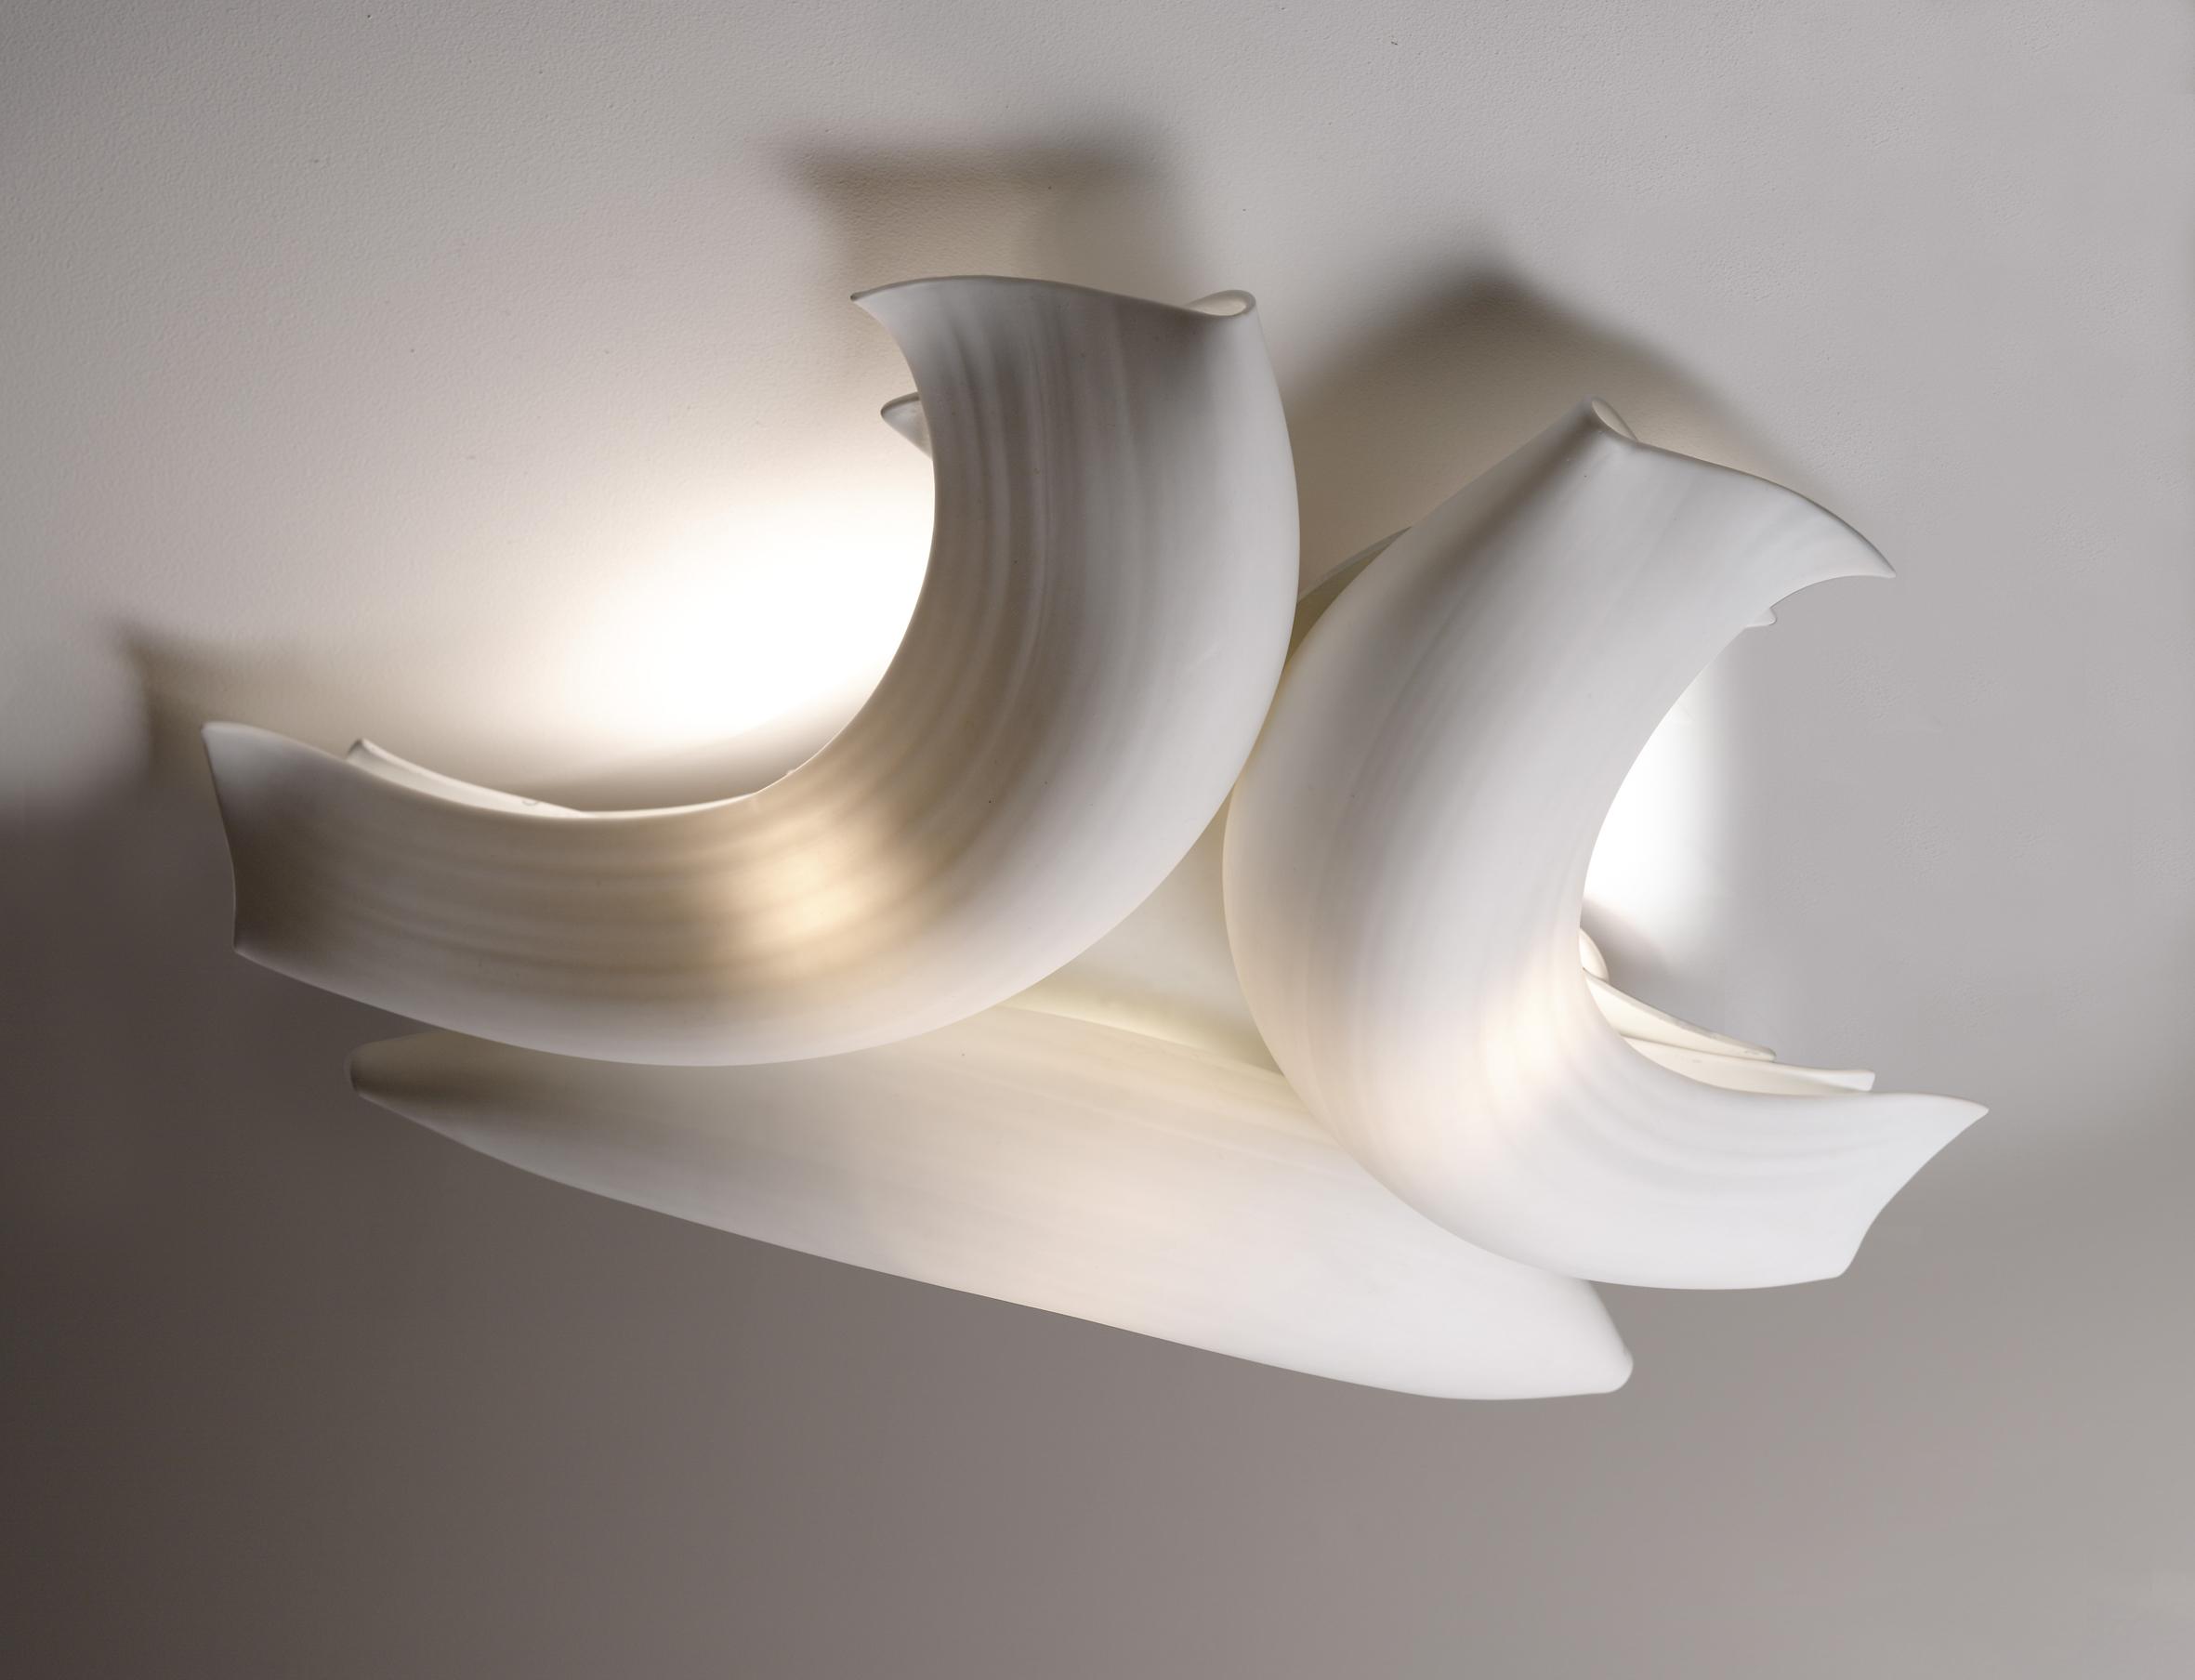 37. Cast Ceiling light.